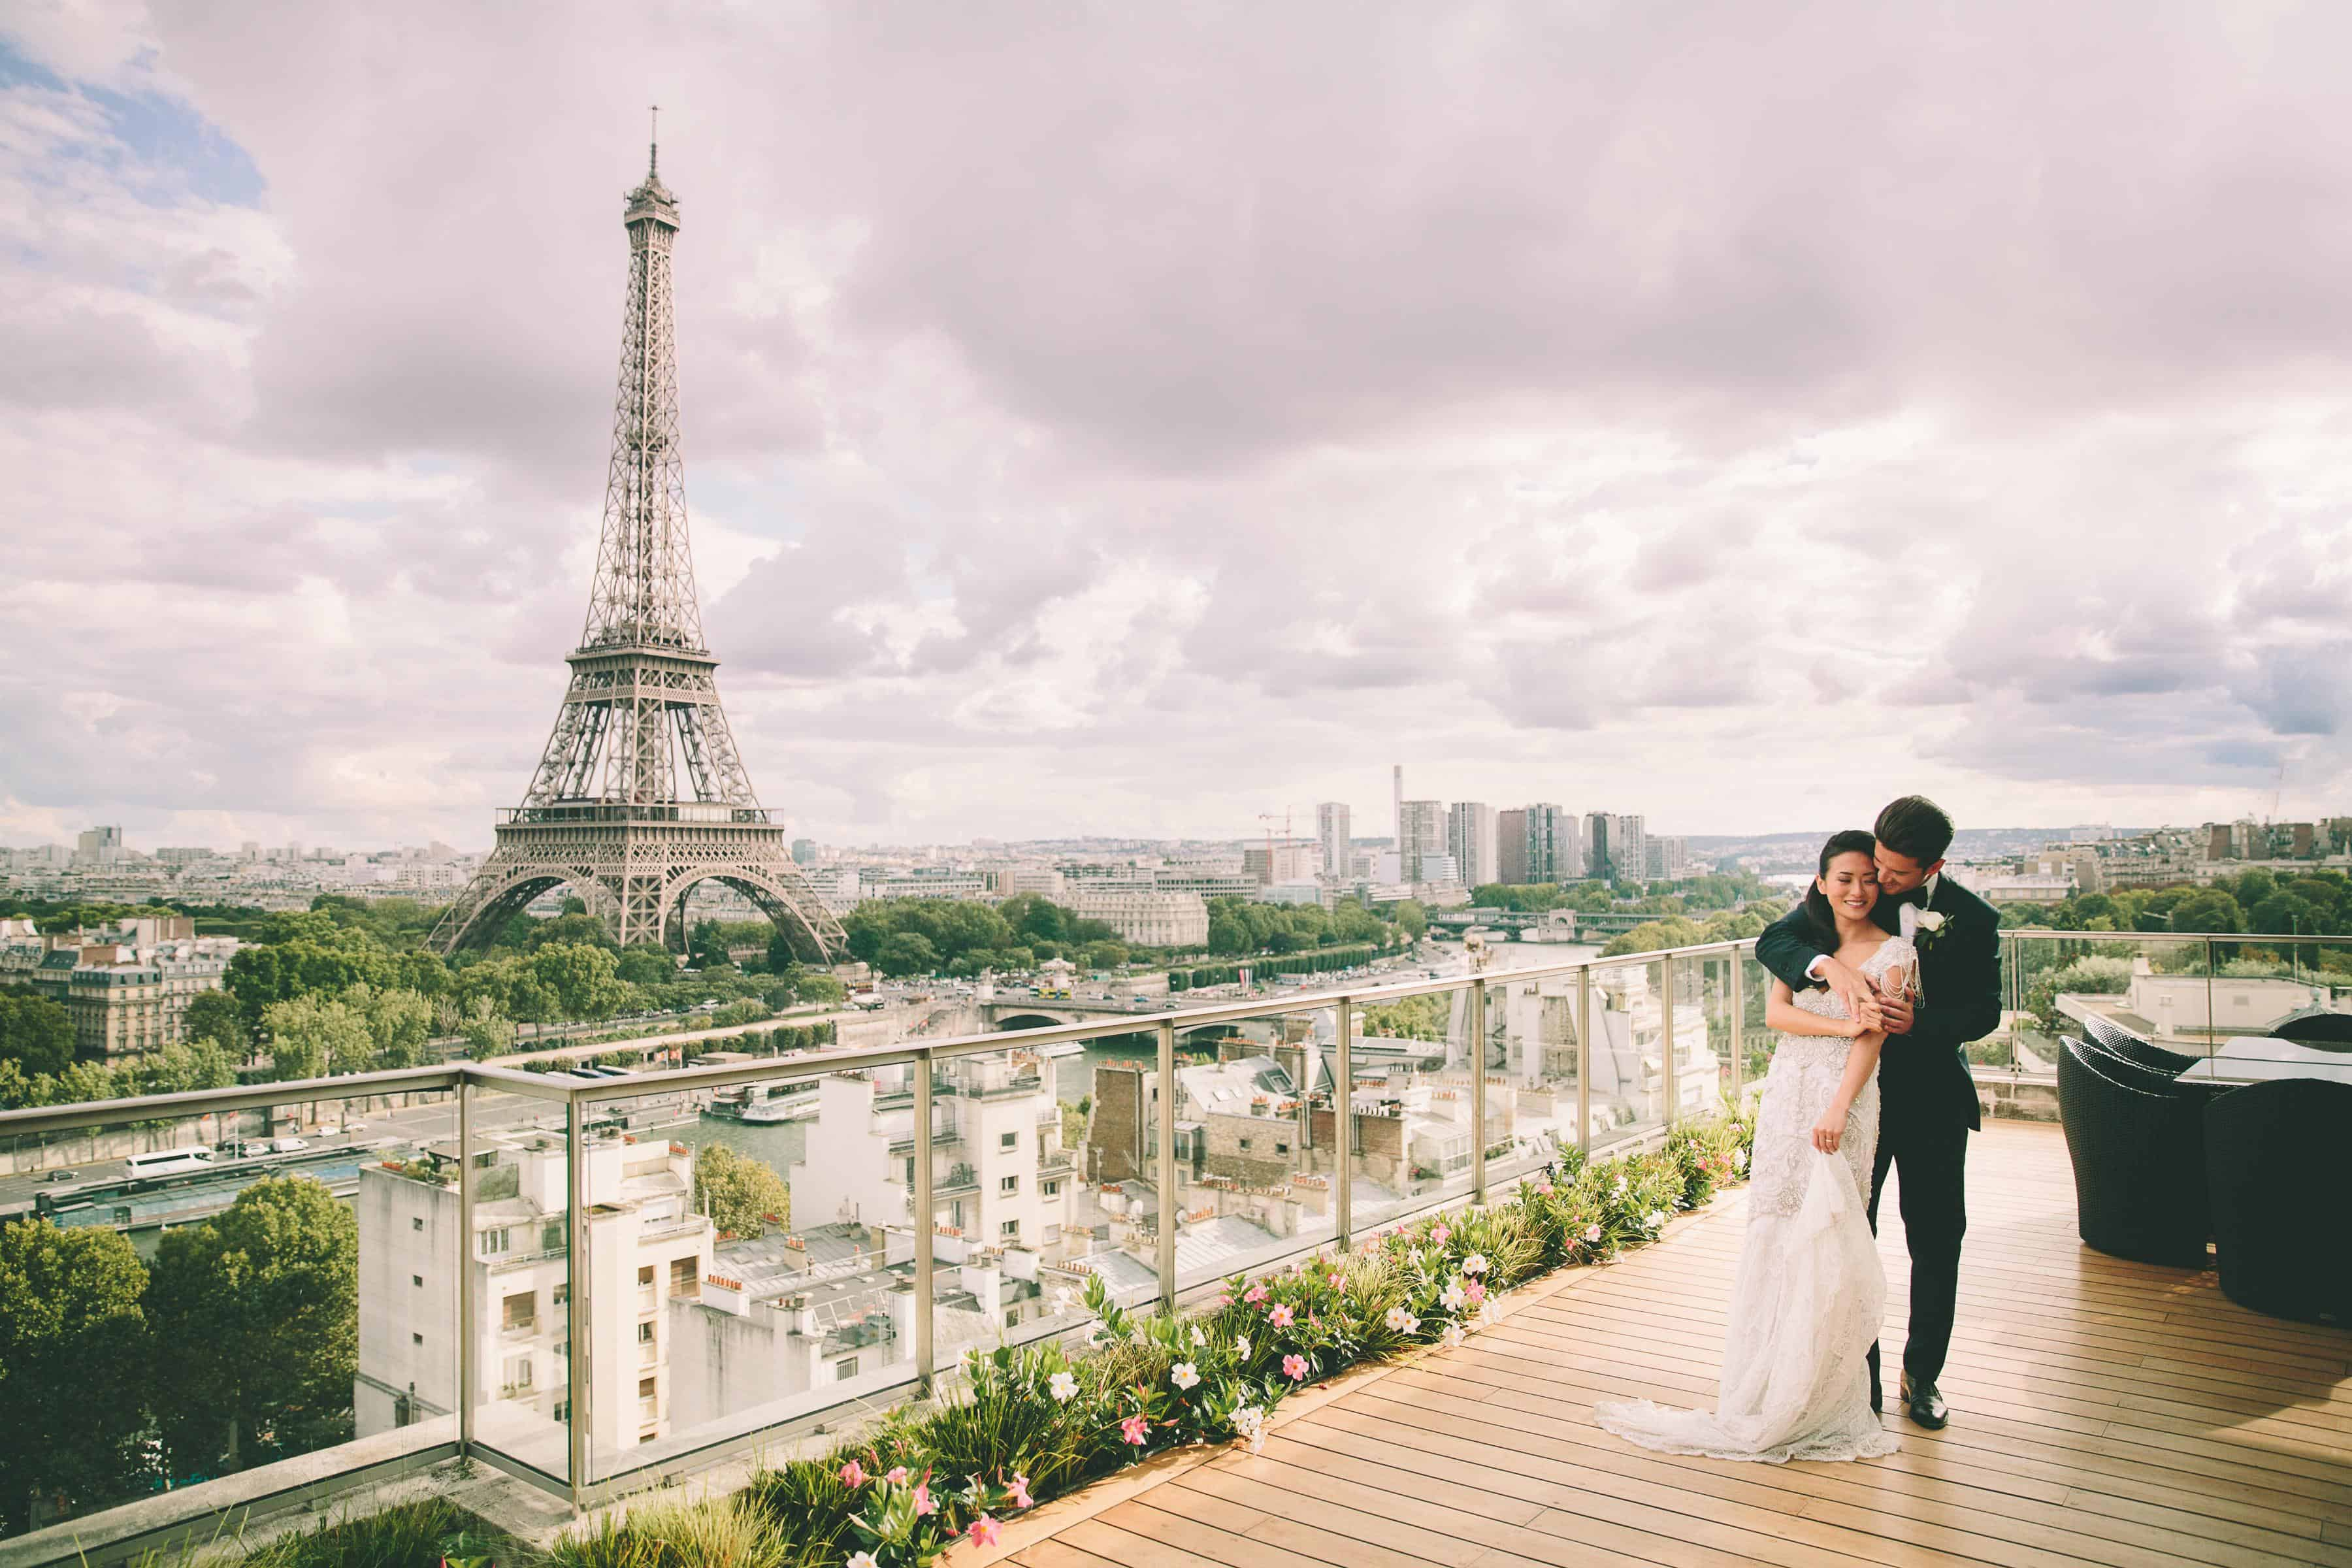 Shangri la Paris wedding photographer www.benandhopeweddings.com.au